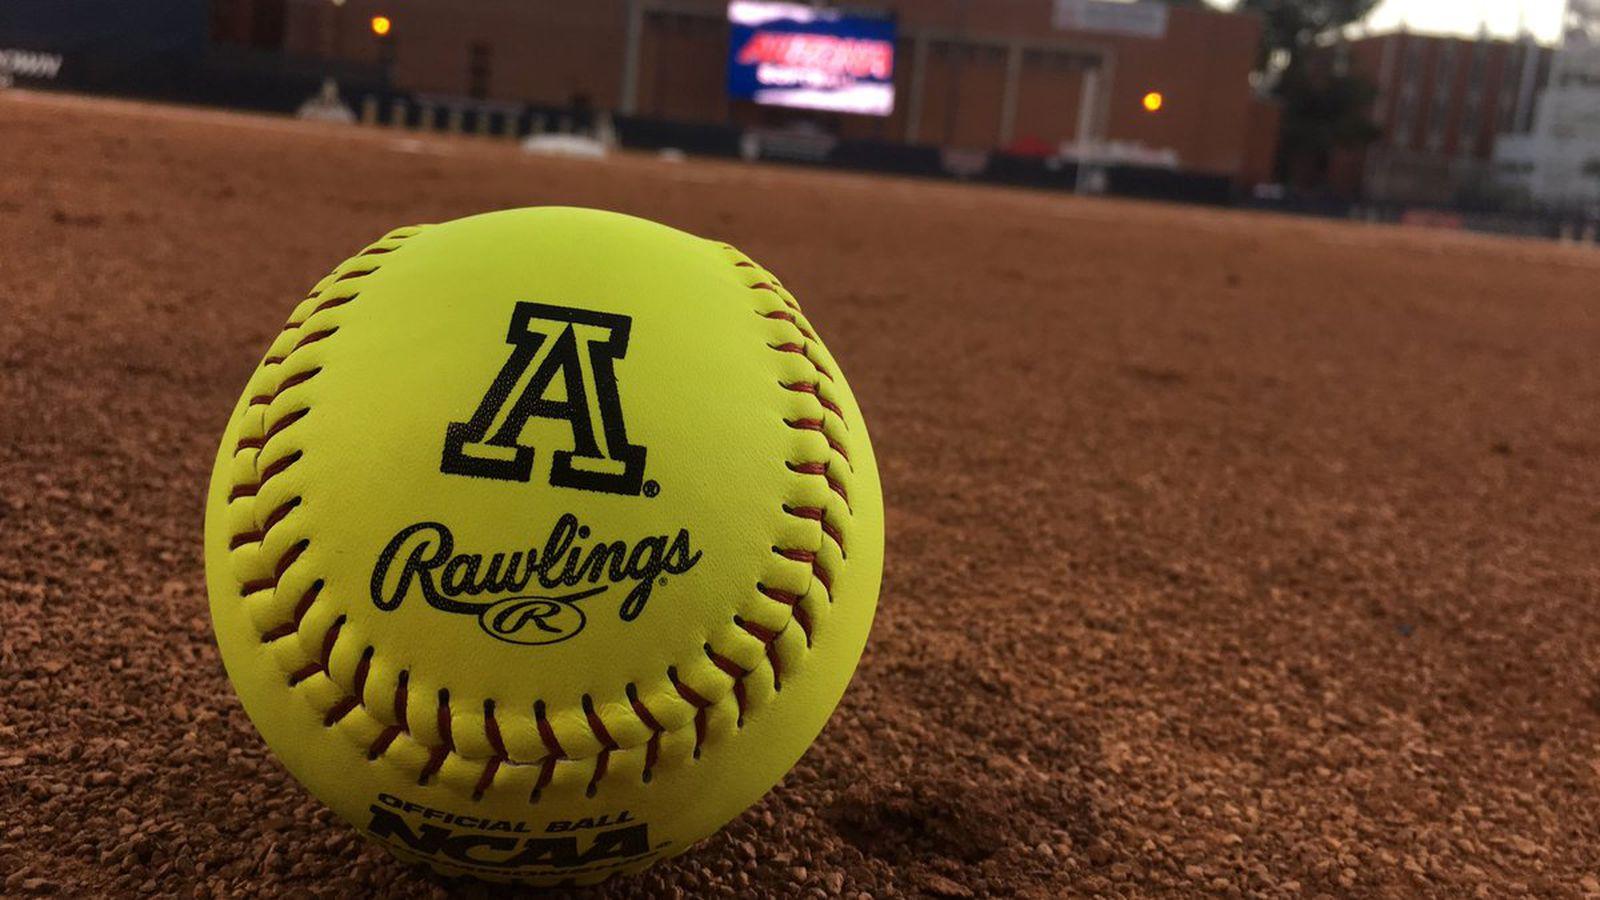 Arizona_softball_literal.0